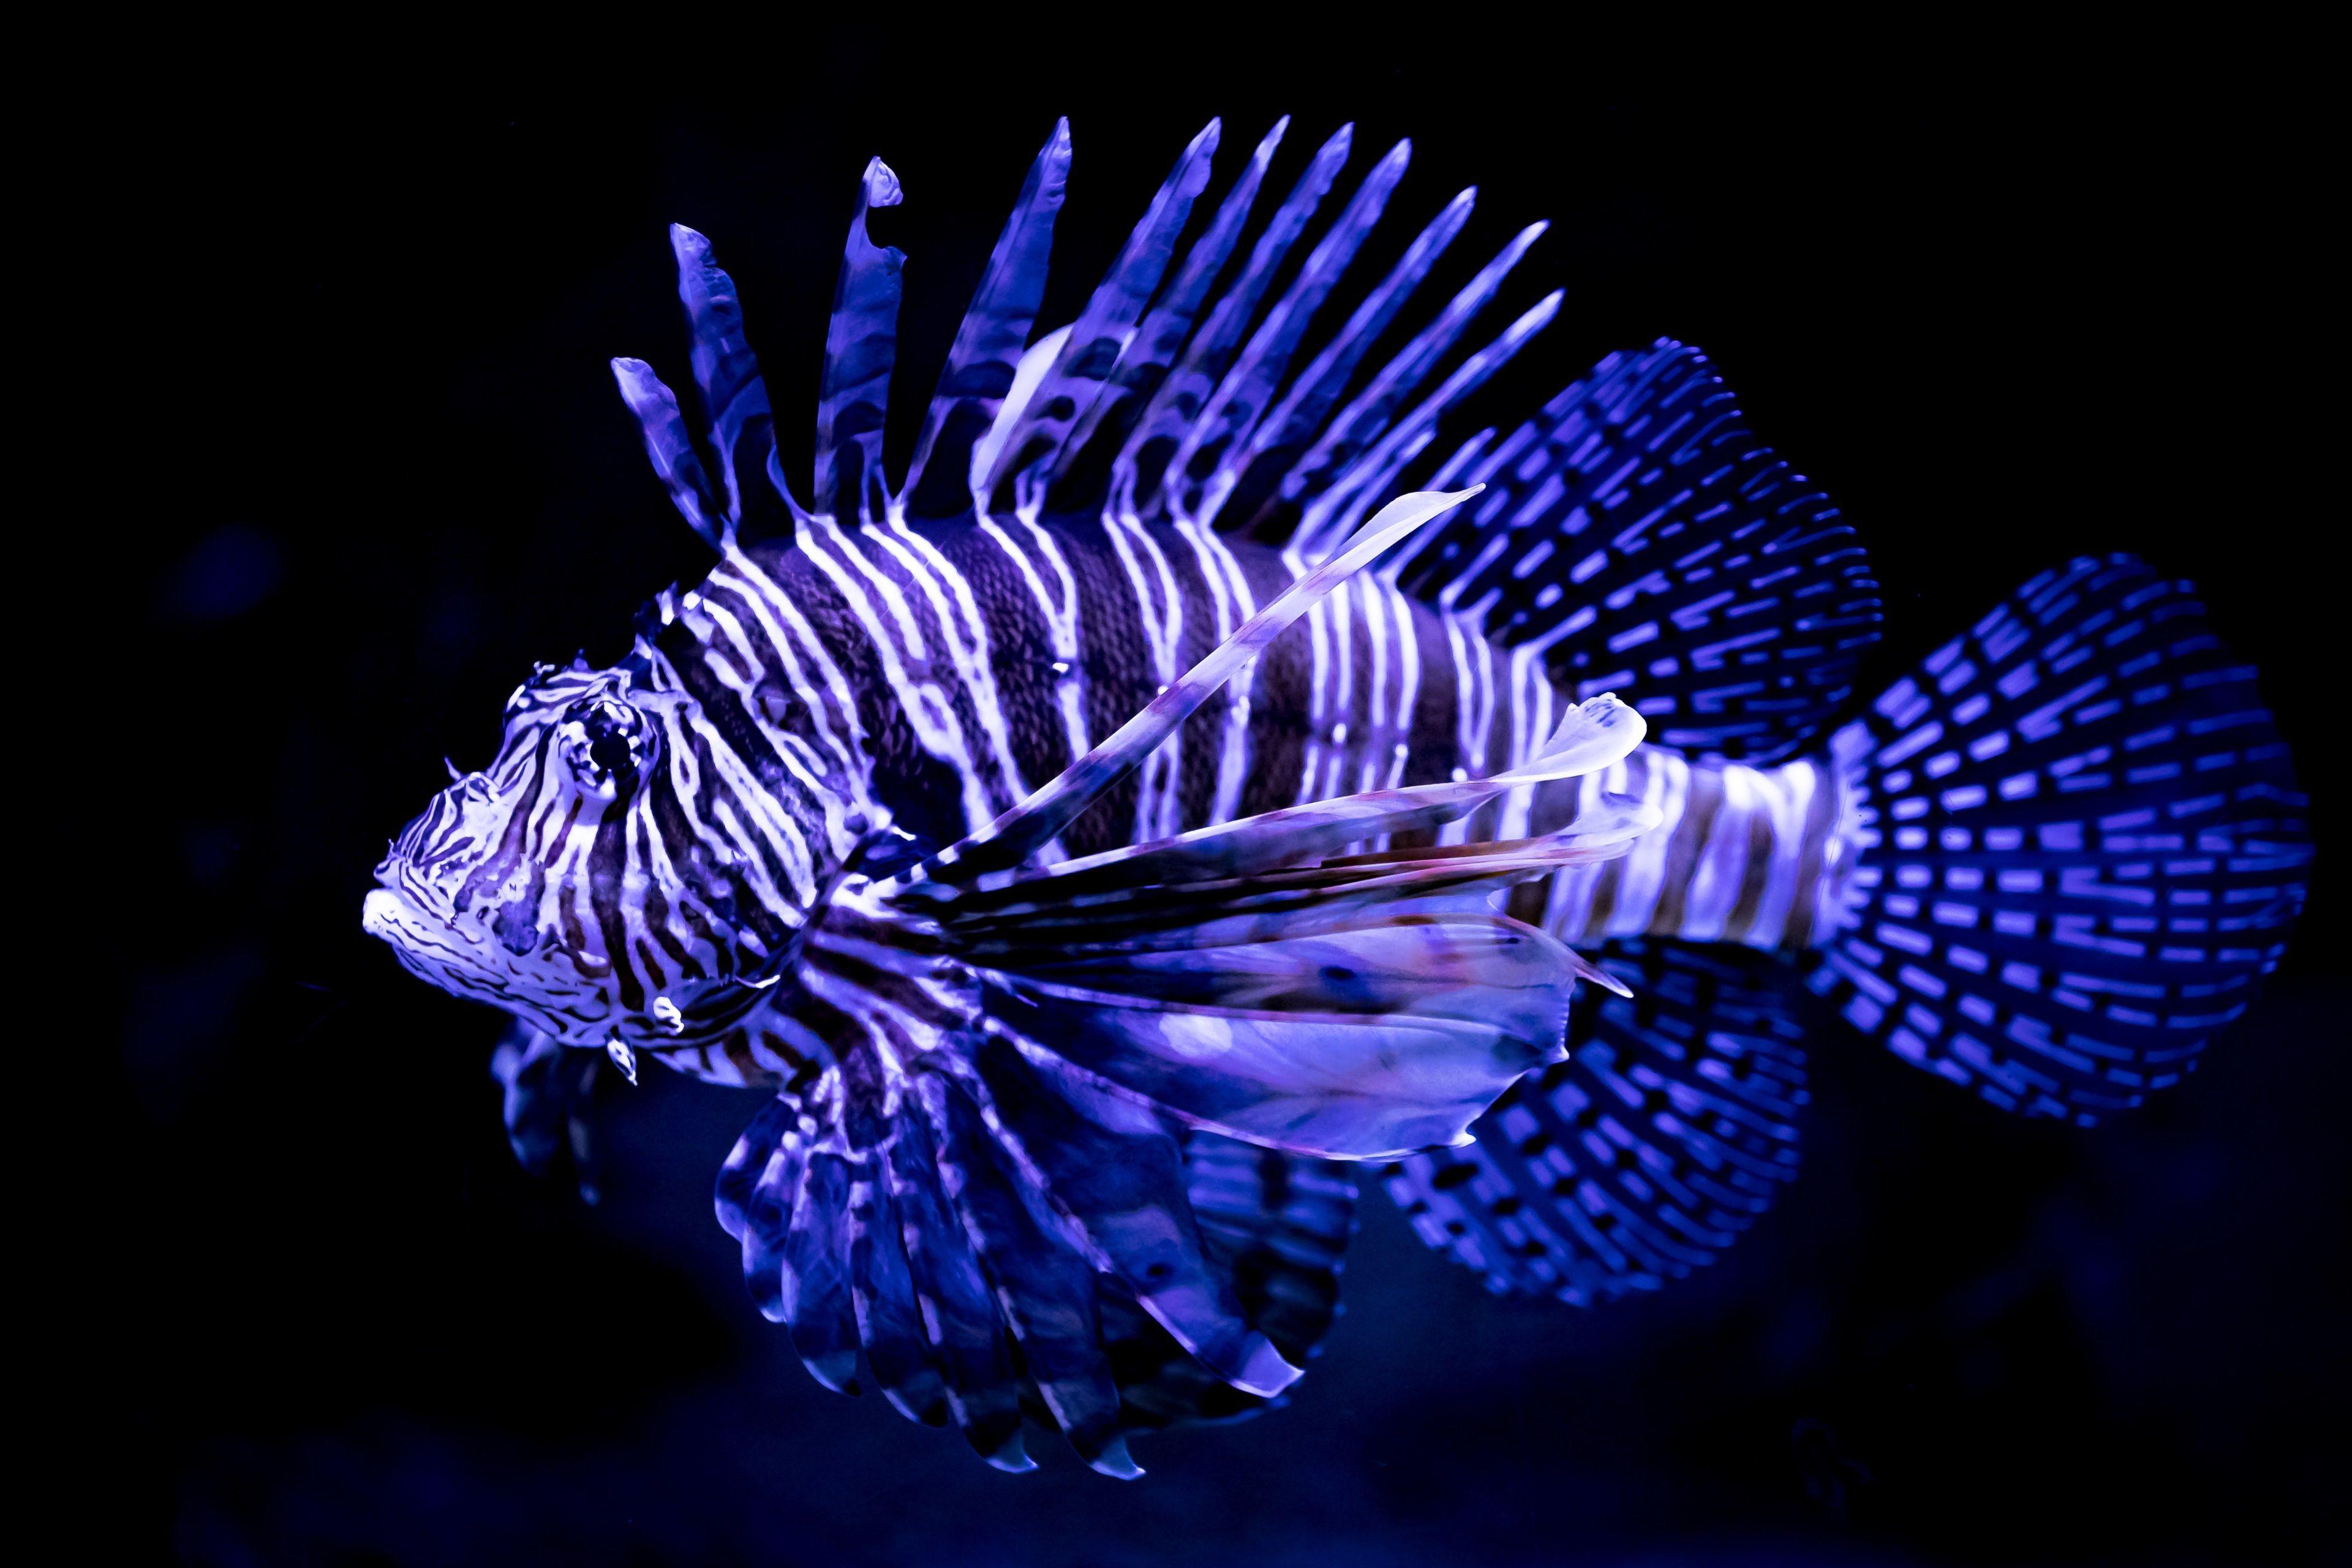 3840x2560 Lionfish 4k Free Wallpaper Lion Fish Beautiful Fish Fish